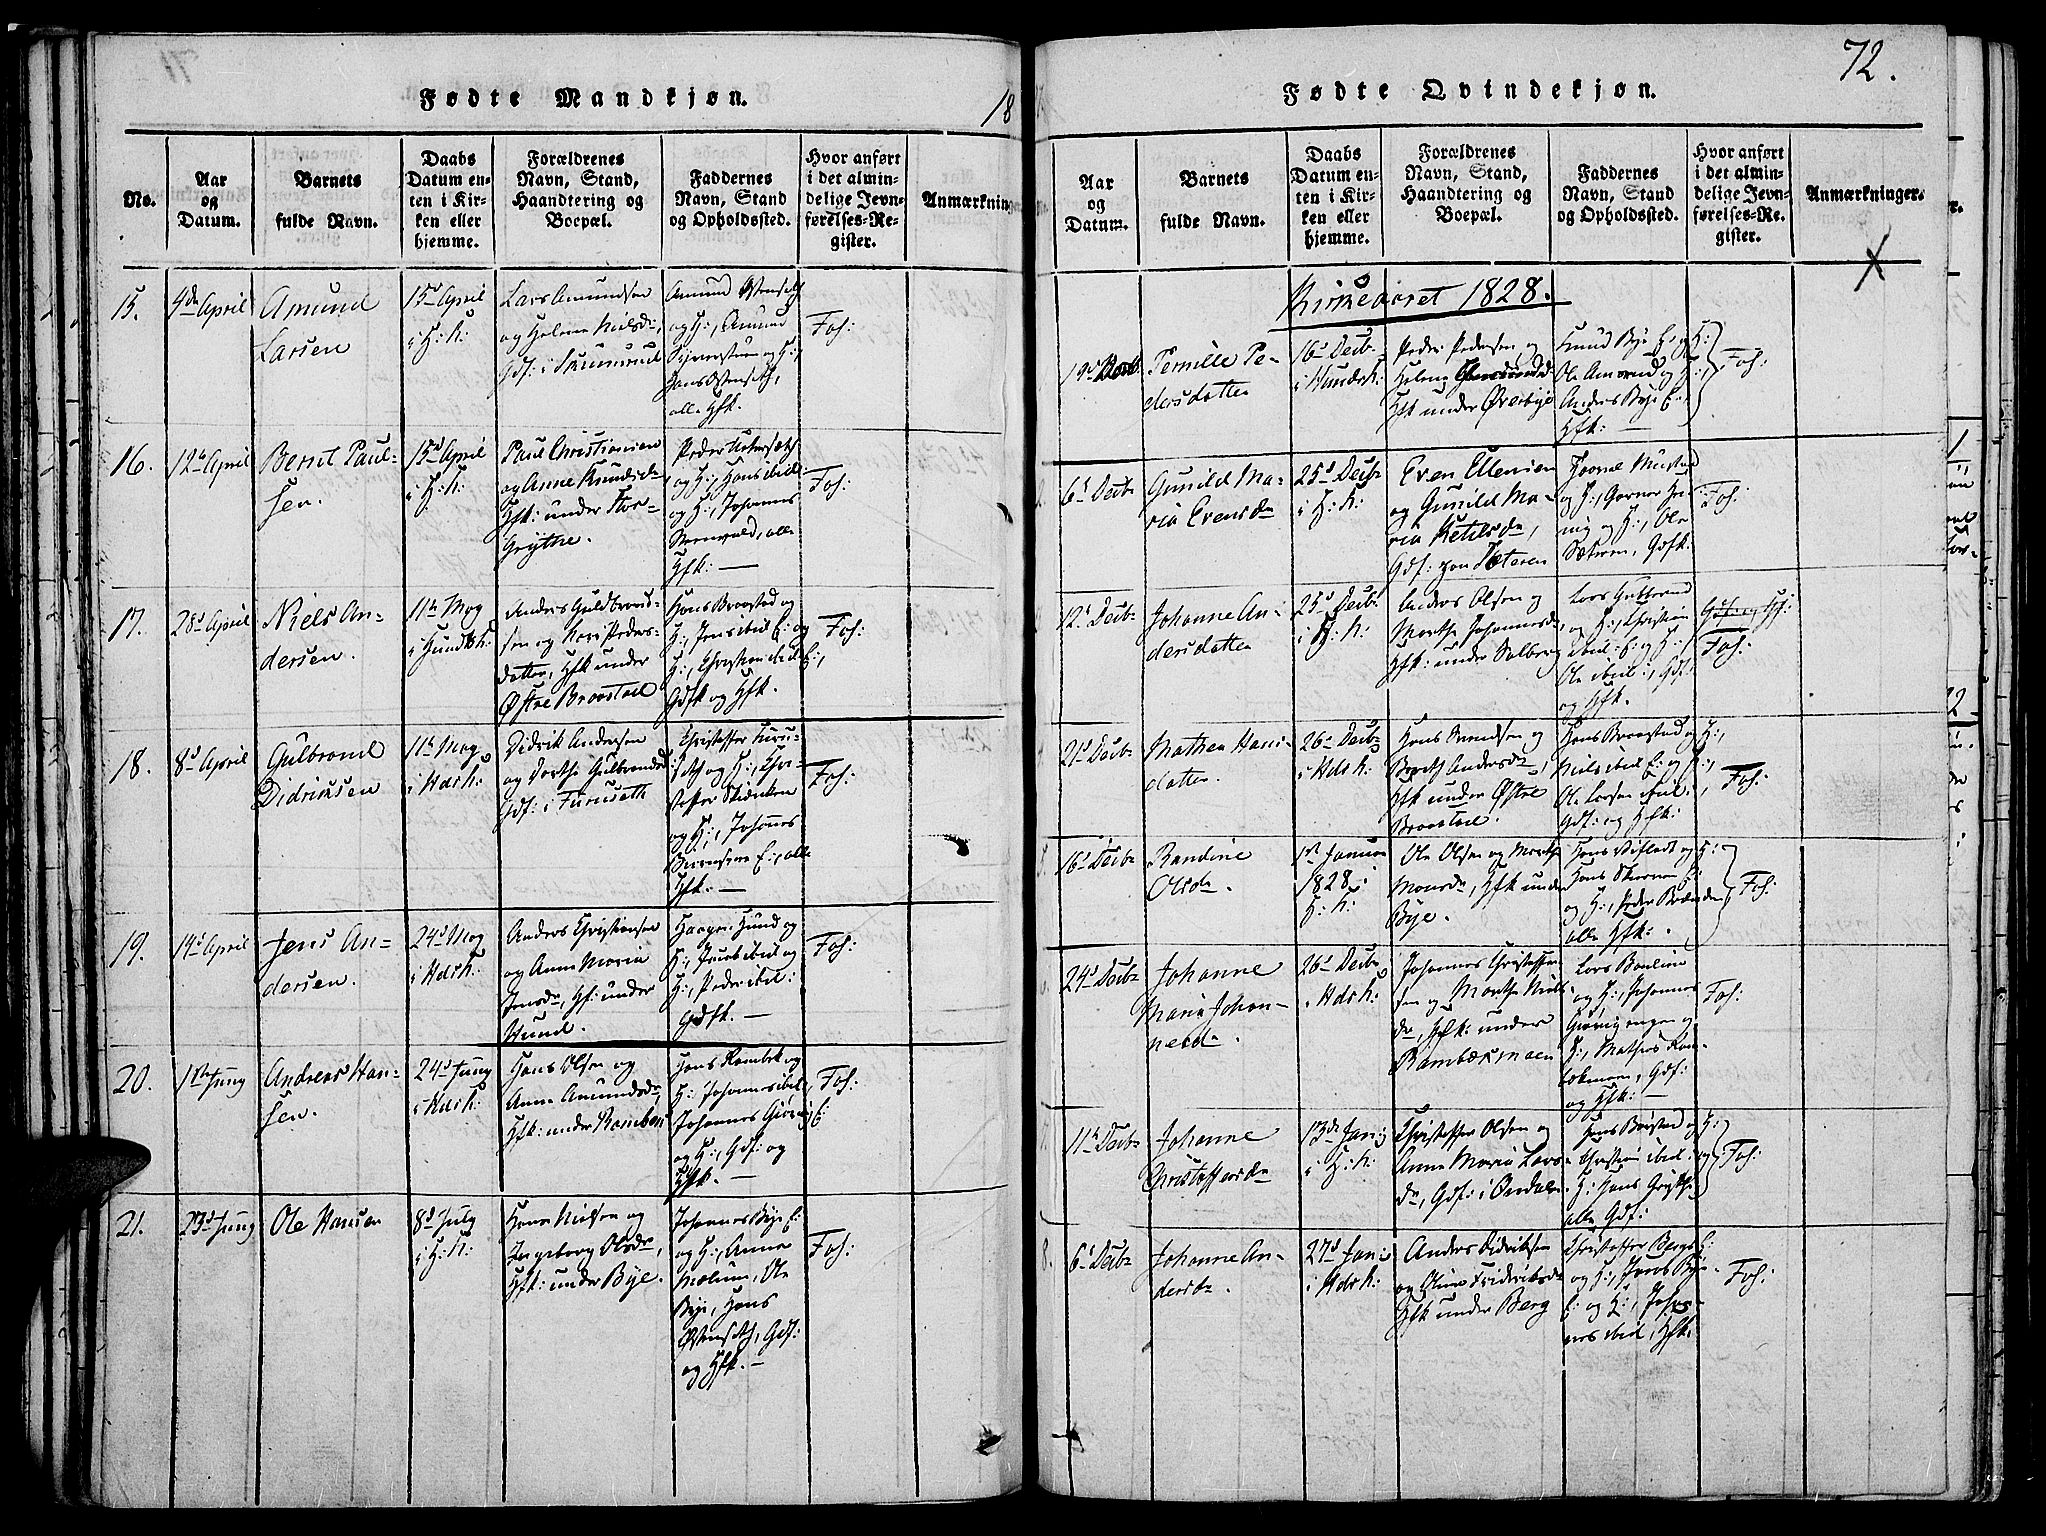 SAH, Vardal prestekontor, H/Ha/Haa/L0004: Ministerialbok nr. 4, 1814-1831, s. 72